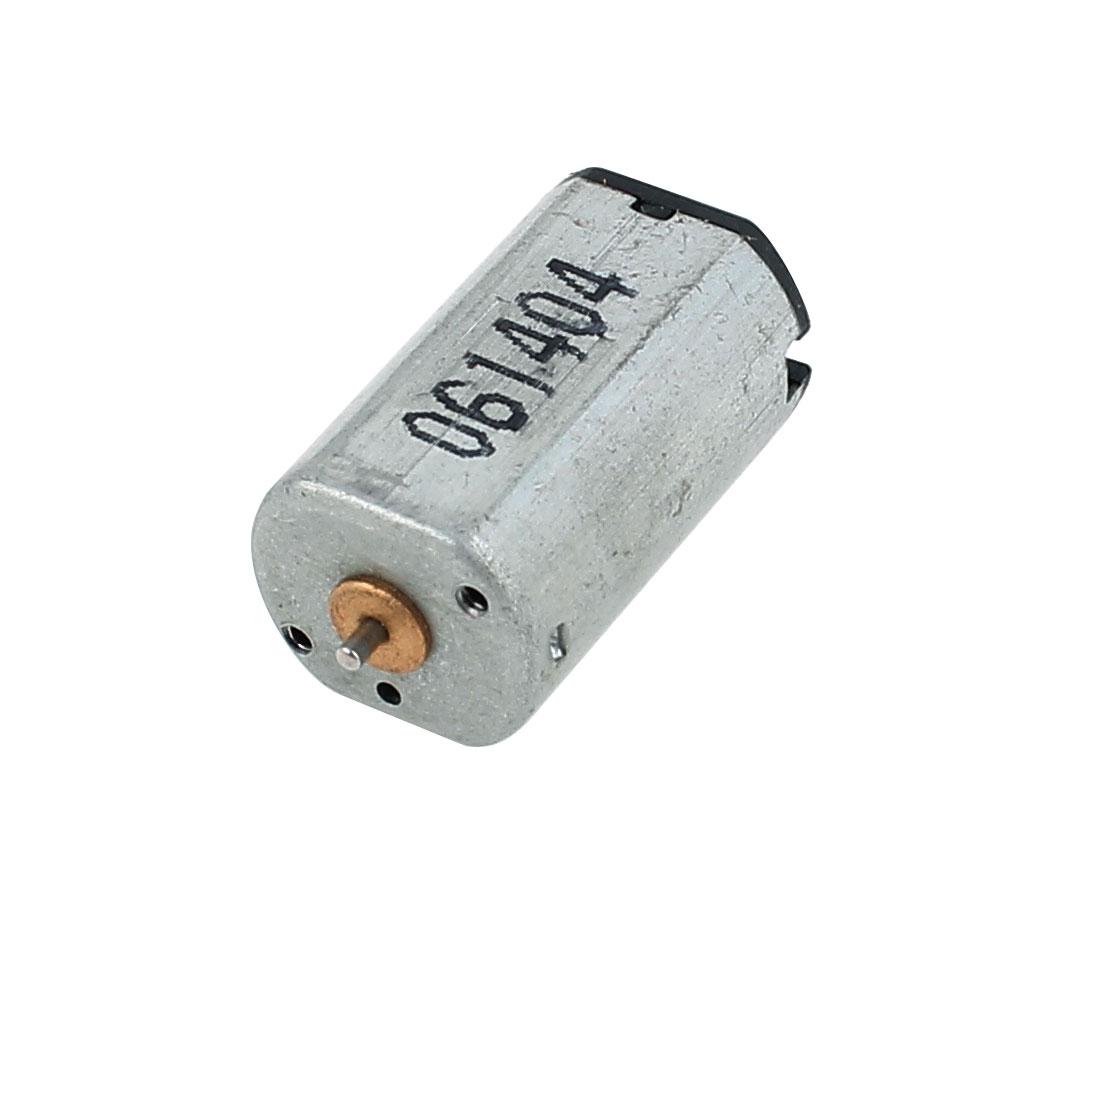 DC 3V12000RPM Output Speed Electronic Toy Mini Vibration Motor